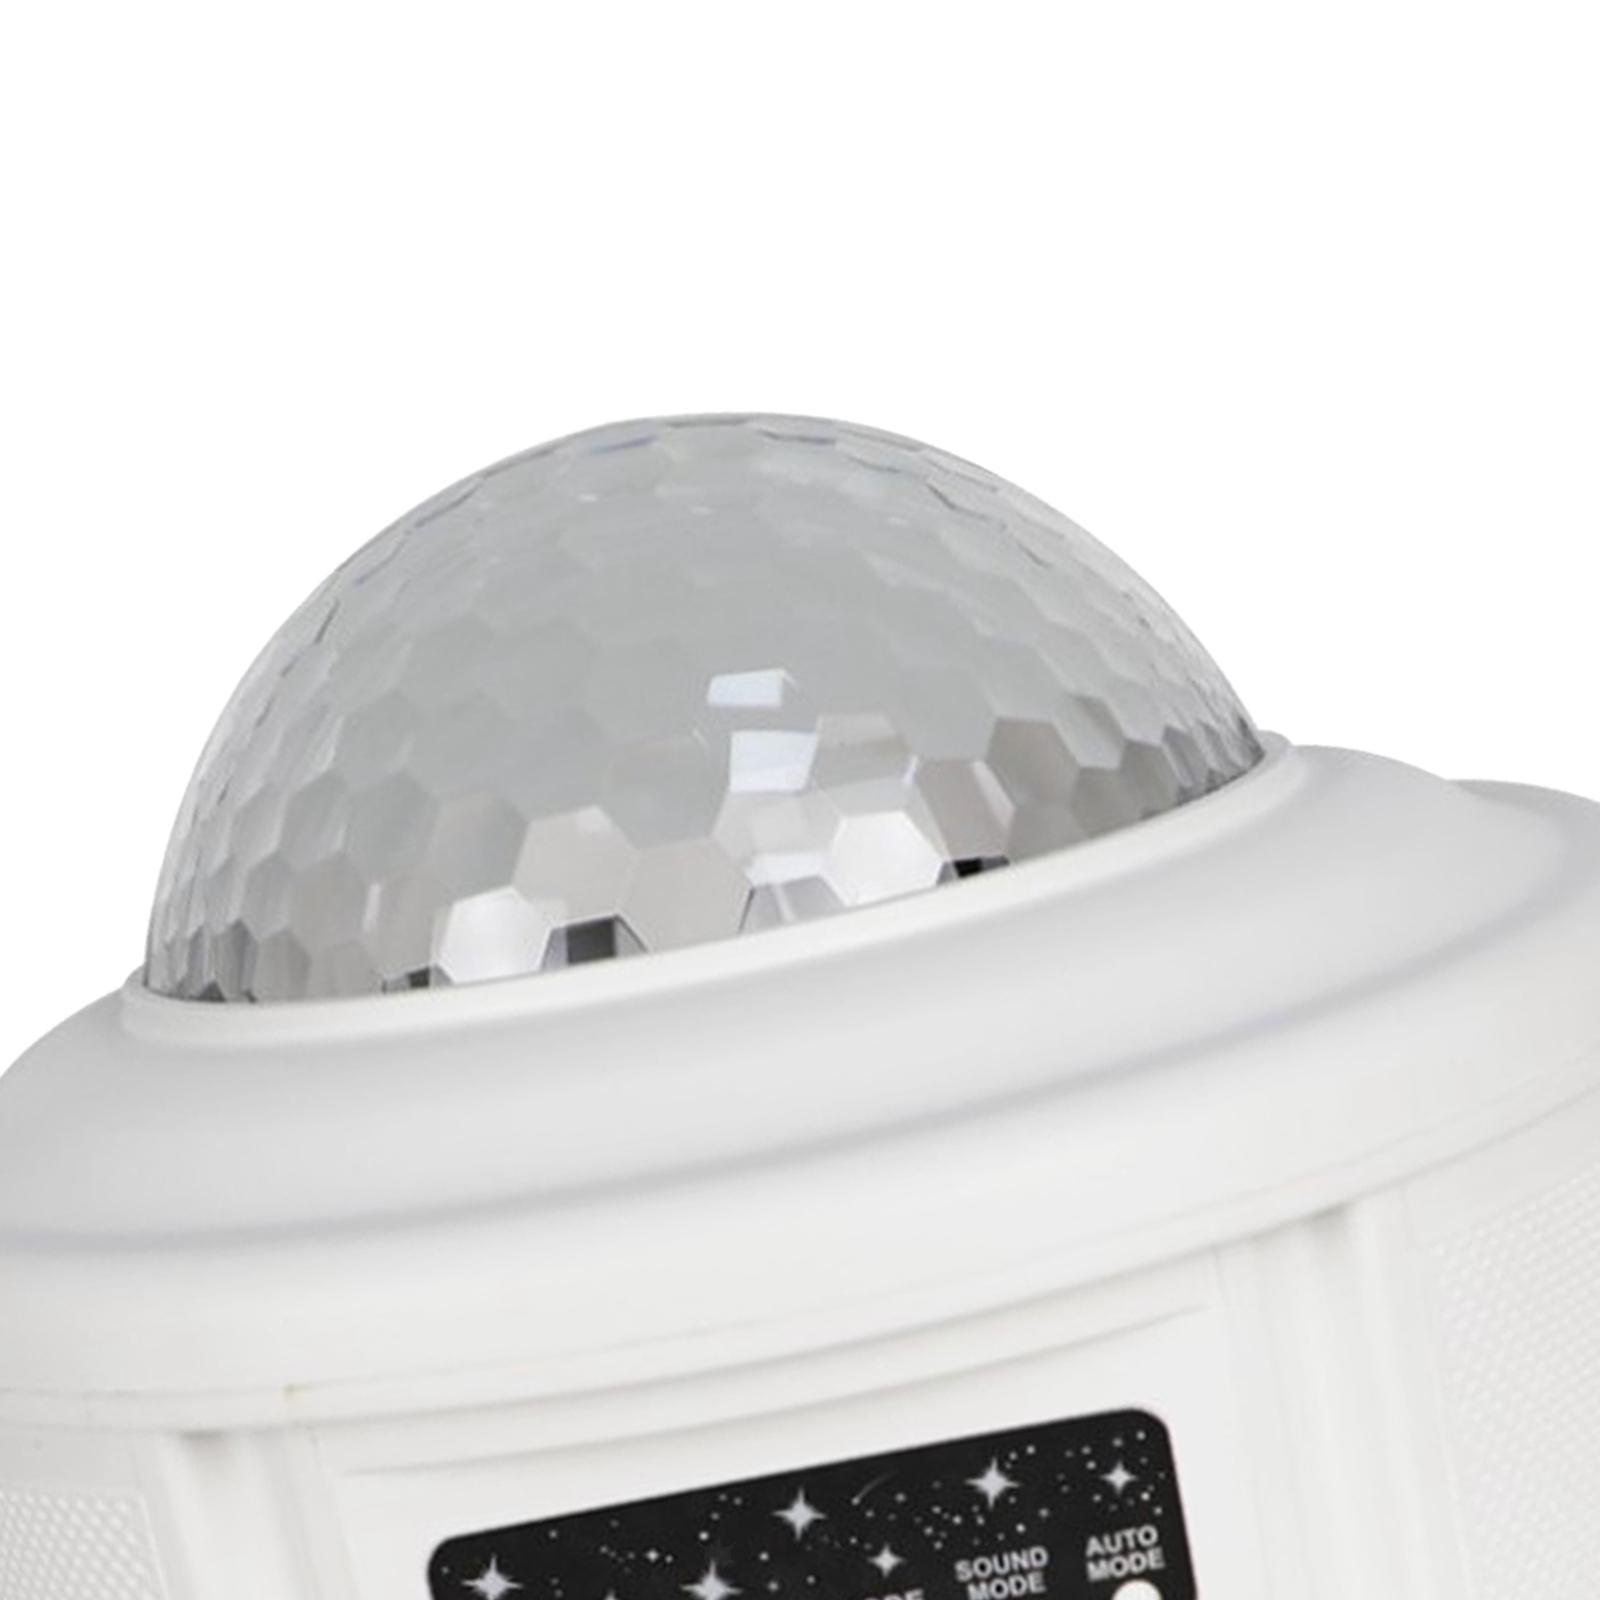 miniatura 6 - Bluetooth-LED-Galaxy-Proiettore-Lampada-notturna-stellata-Luce-notturna-a